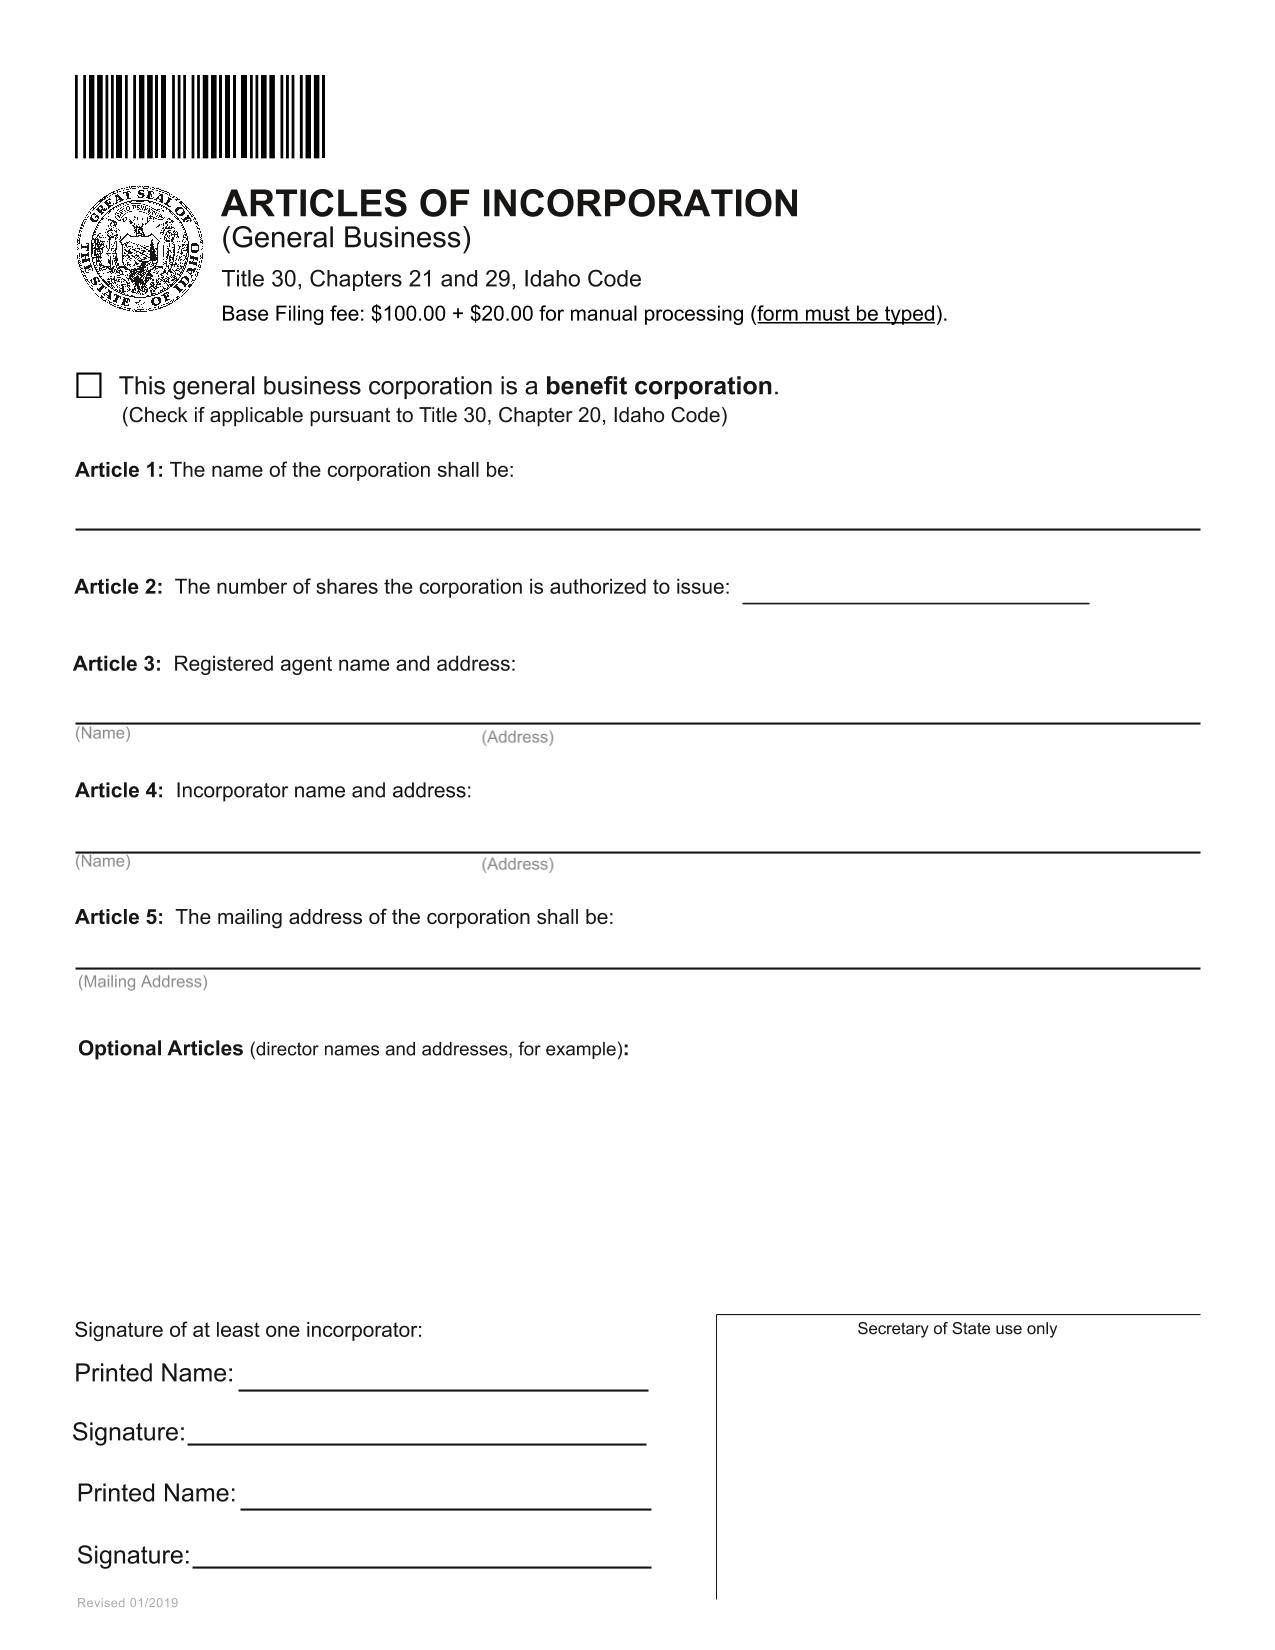 Idaho Articles of Incorporation